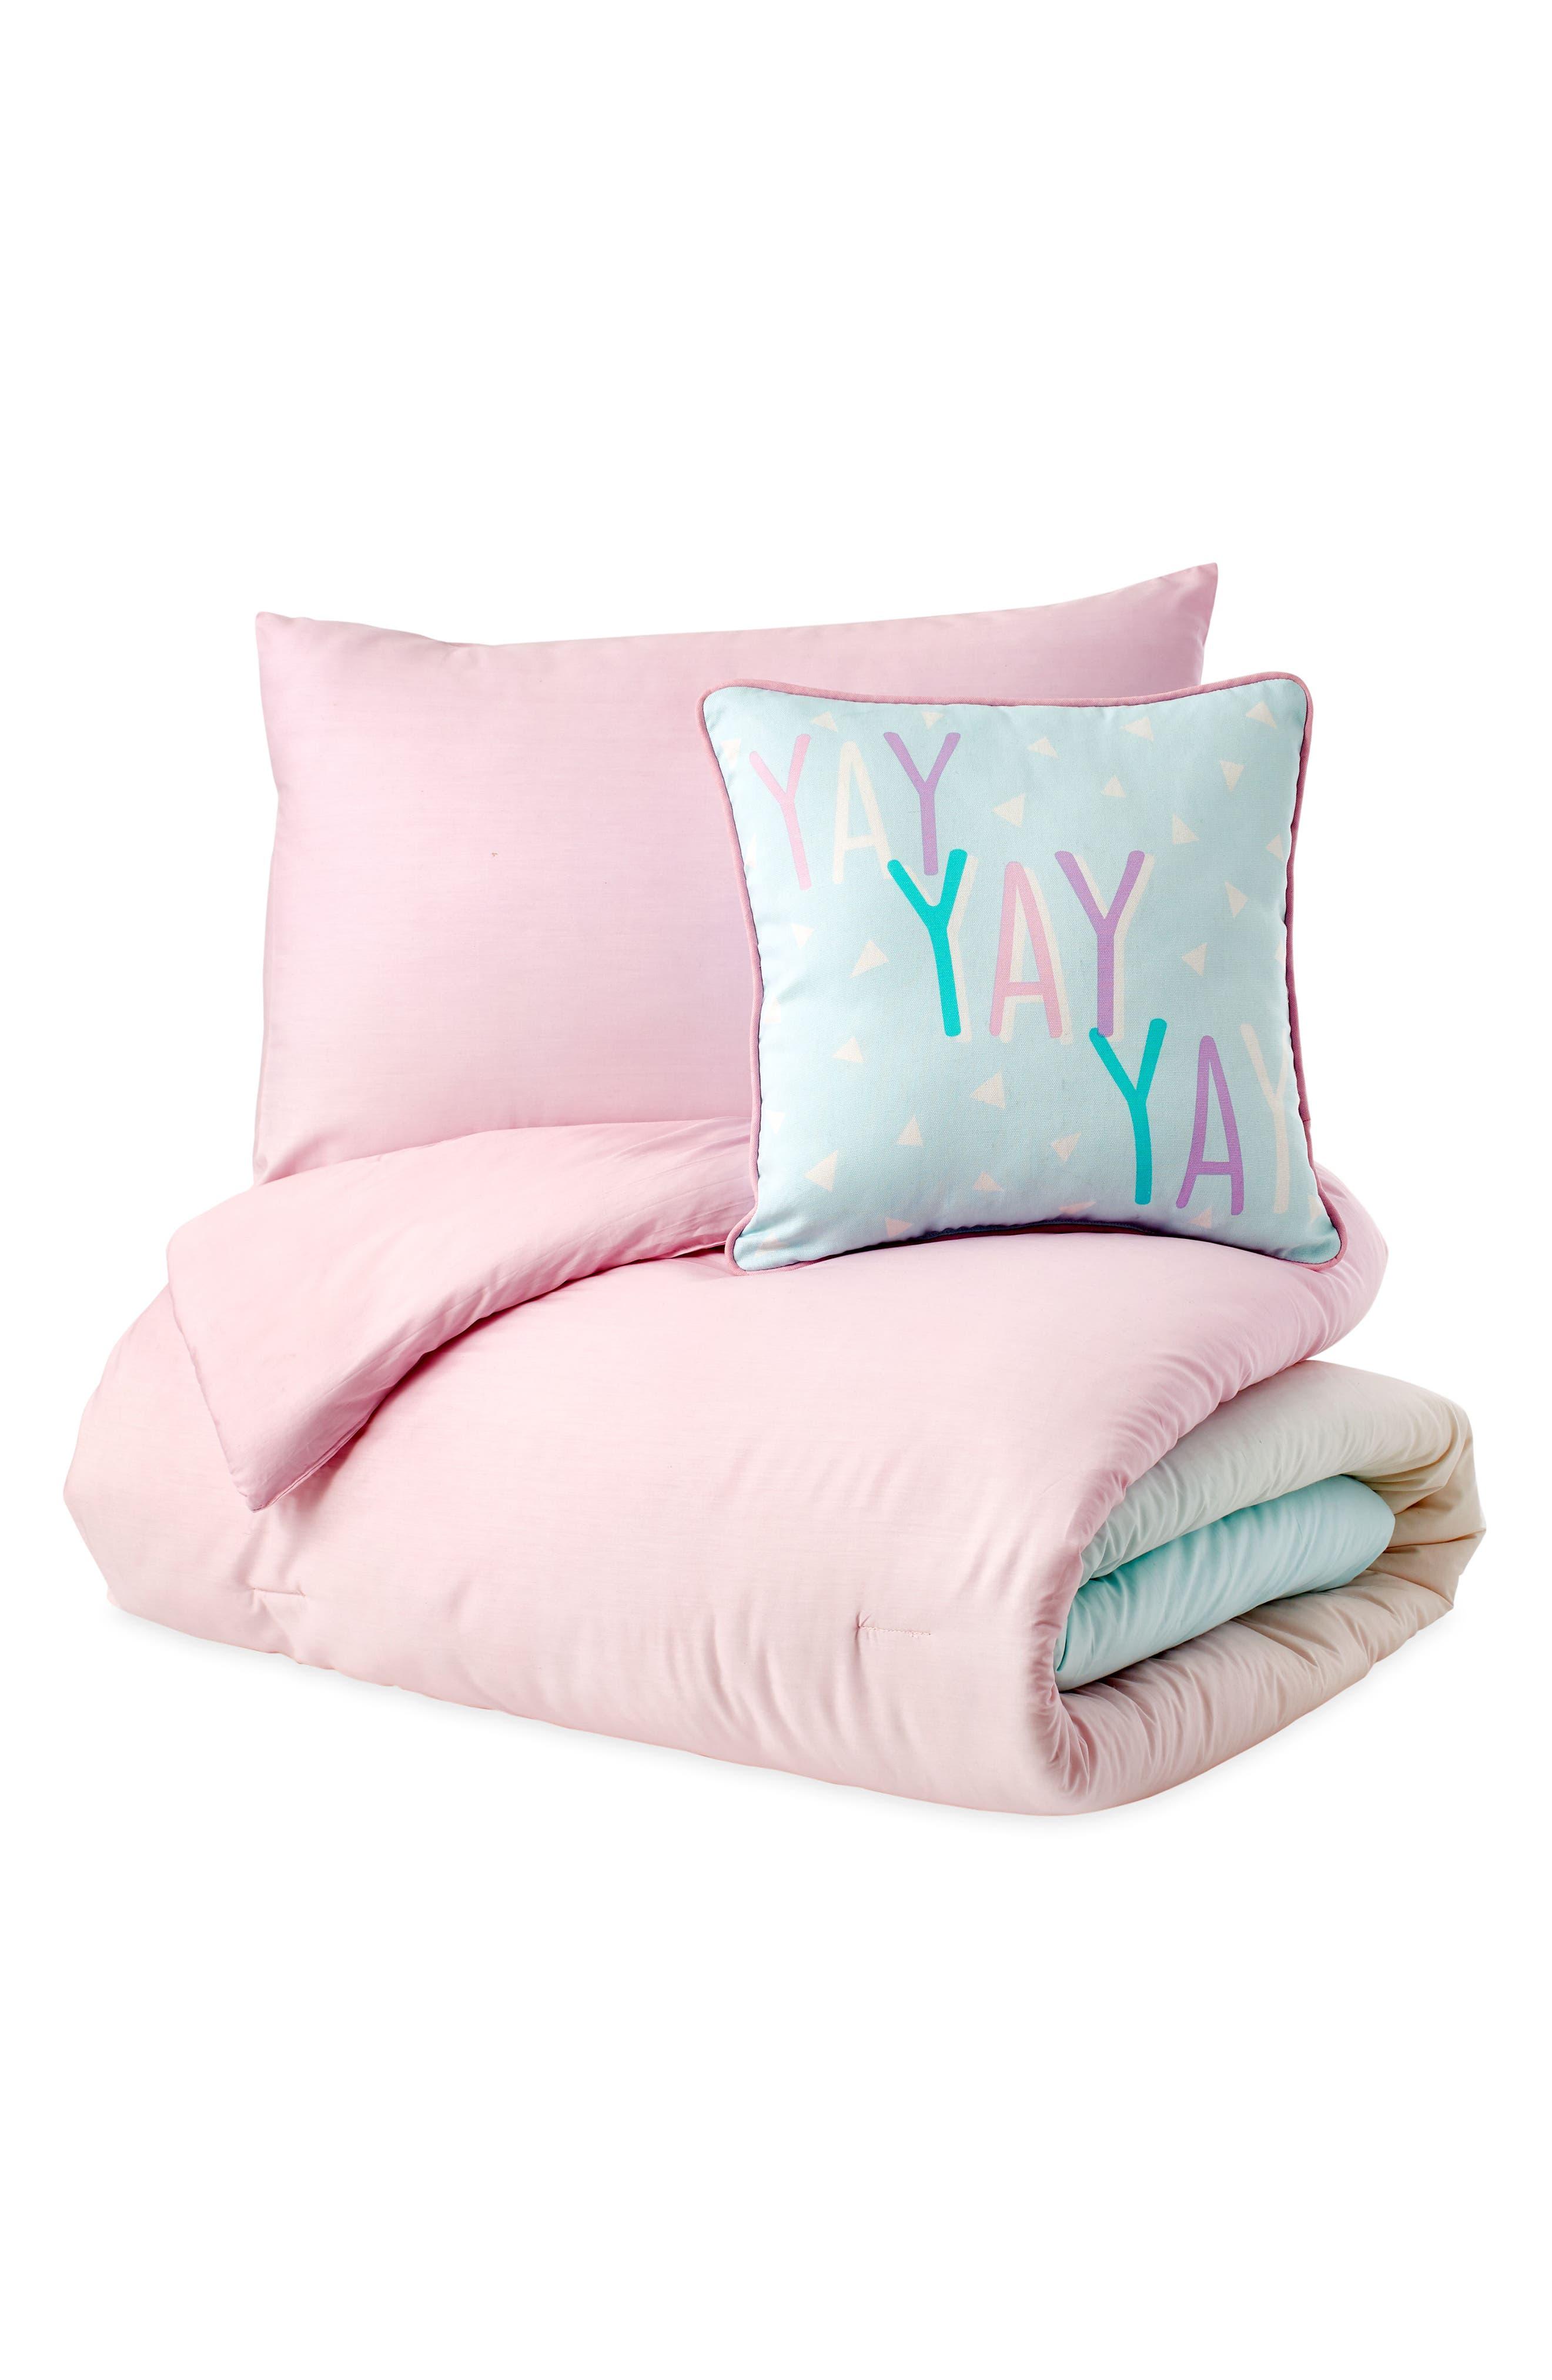 DKNY, Empire Light Comforter, Sham & Accent Pillow Set, Alternate thumbnail 2, color, 675